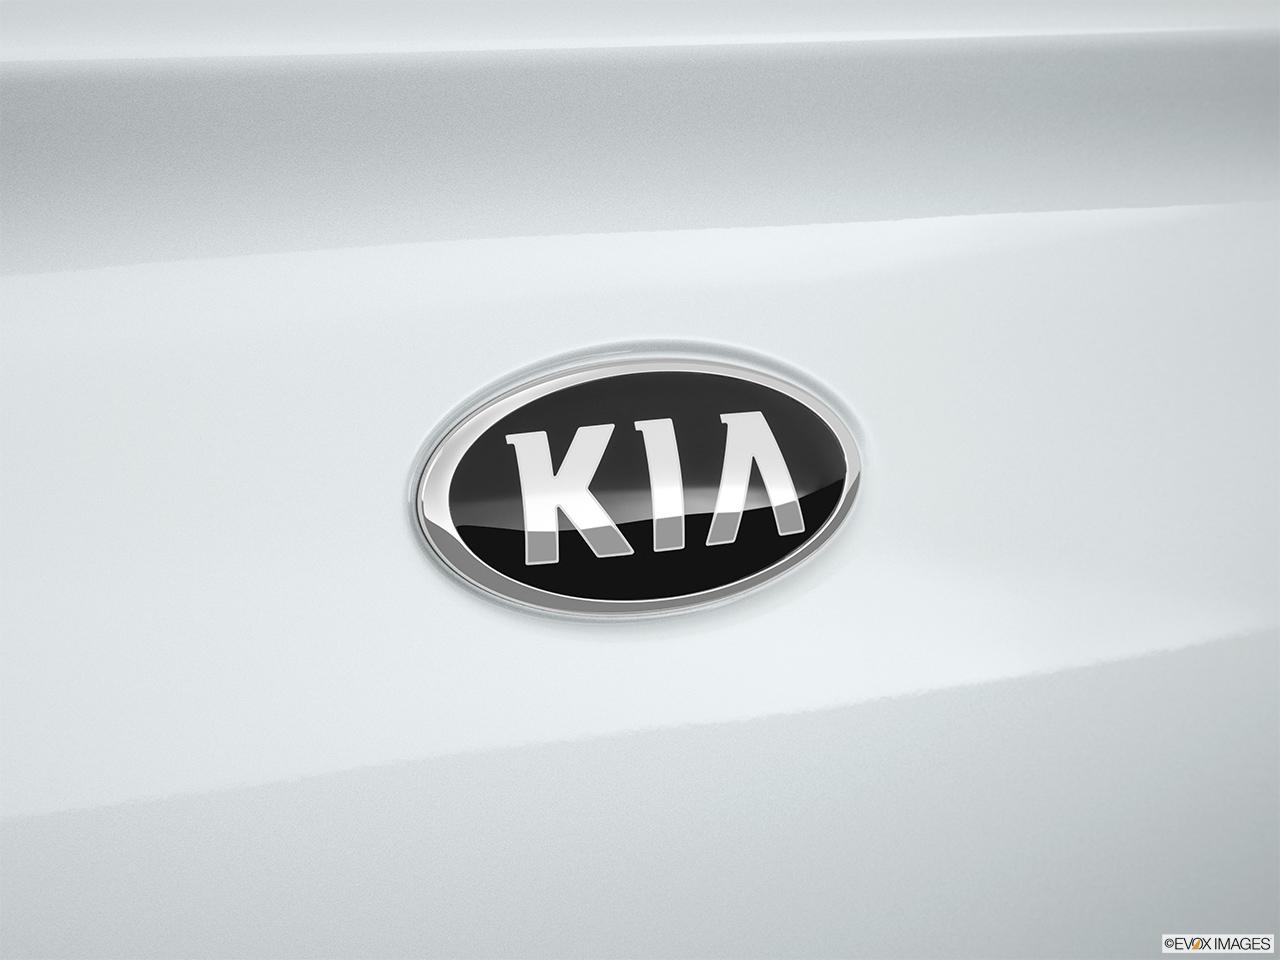 9815st1280138g 2015 kia rio 5 door auto sx hatchback rear manufacture badgeemblem biocorpaavc Image collections